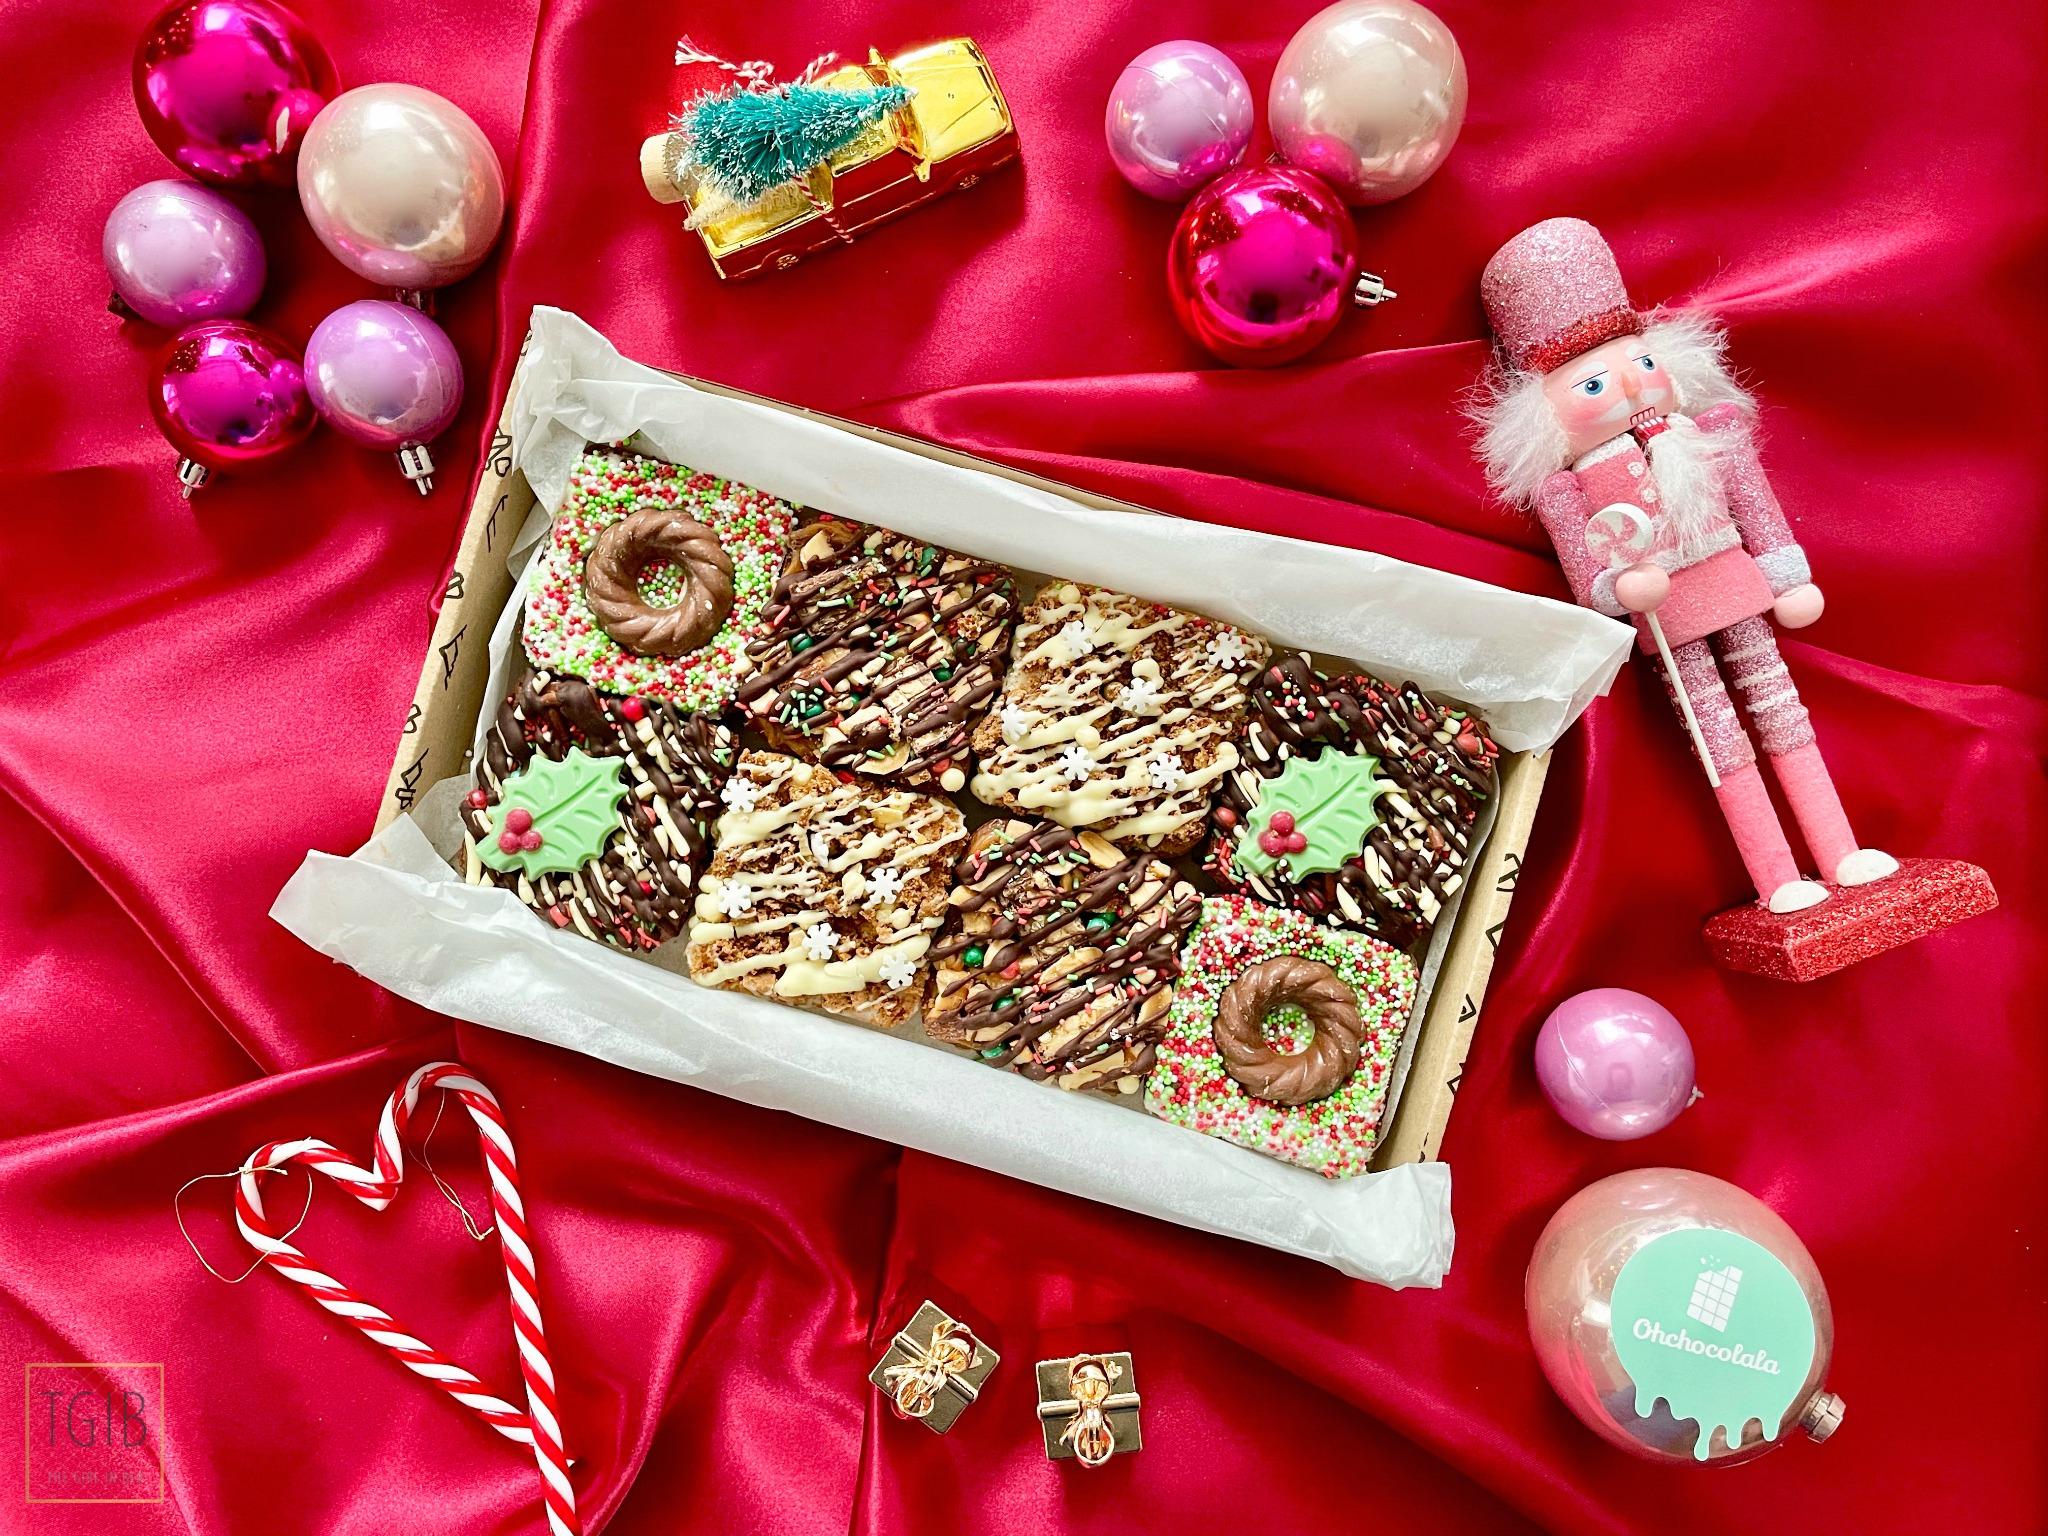 Ohchocolala kerstbrownies brievenbusbox